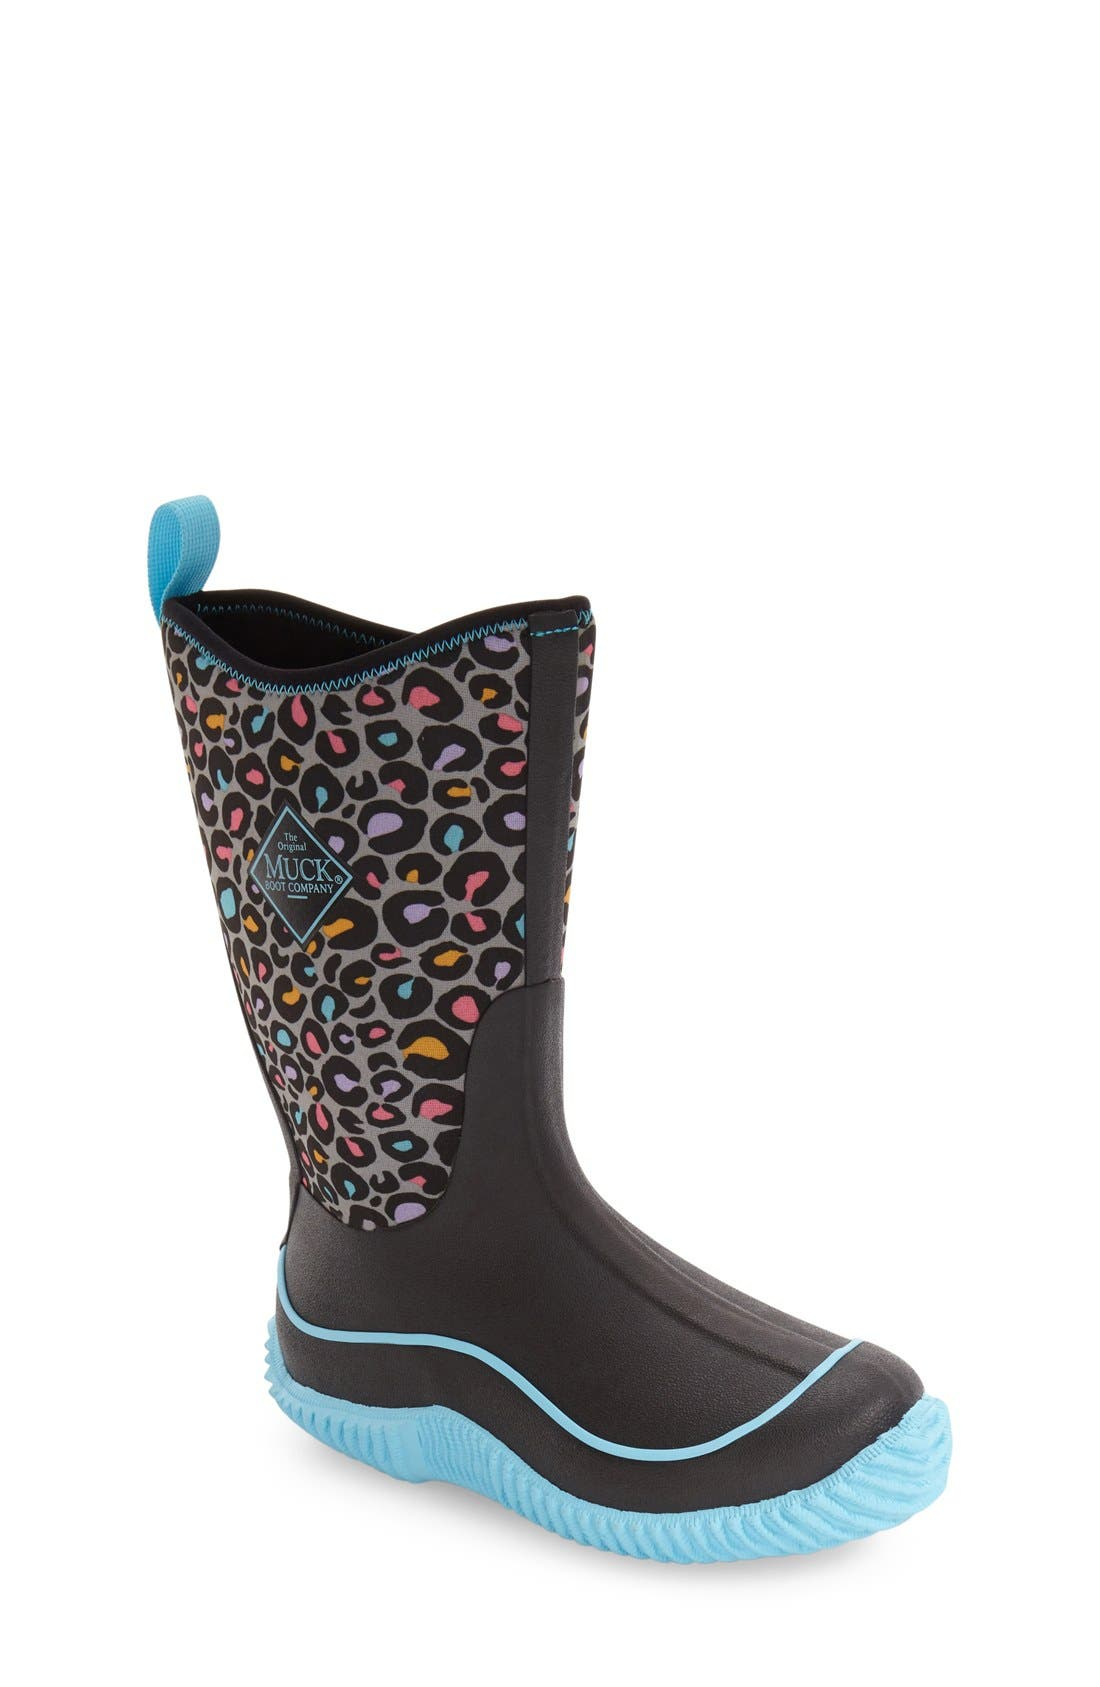 THE ORIGINAL MUCK BOOT COMPANY Hale Waterproof Boot